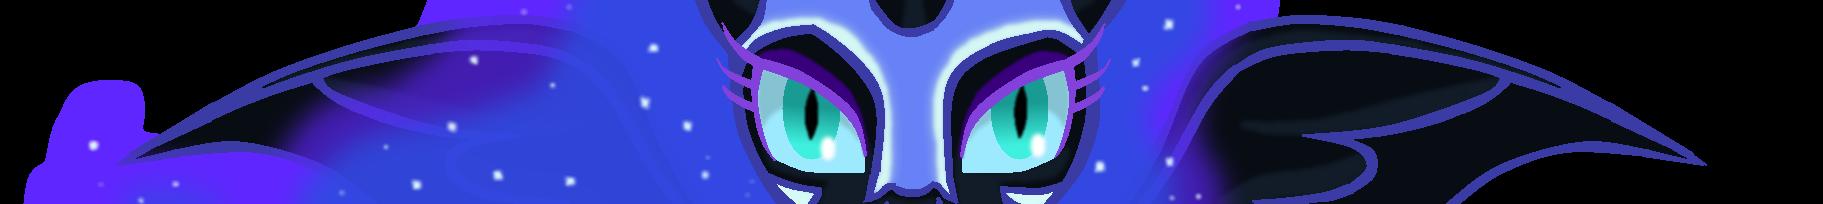 MLP eyebars Nightmare moon by PikeInverse